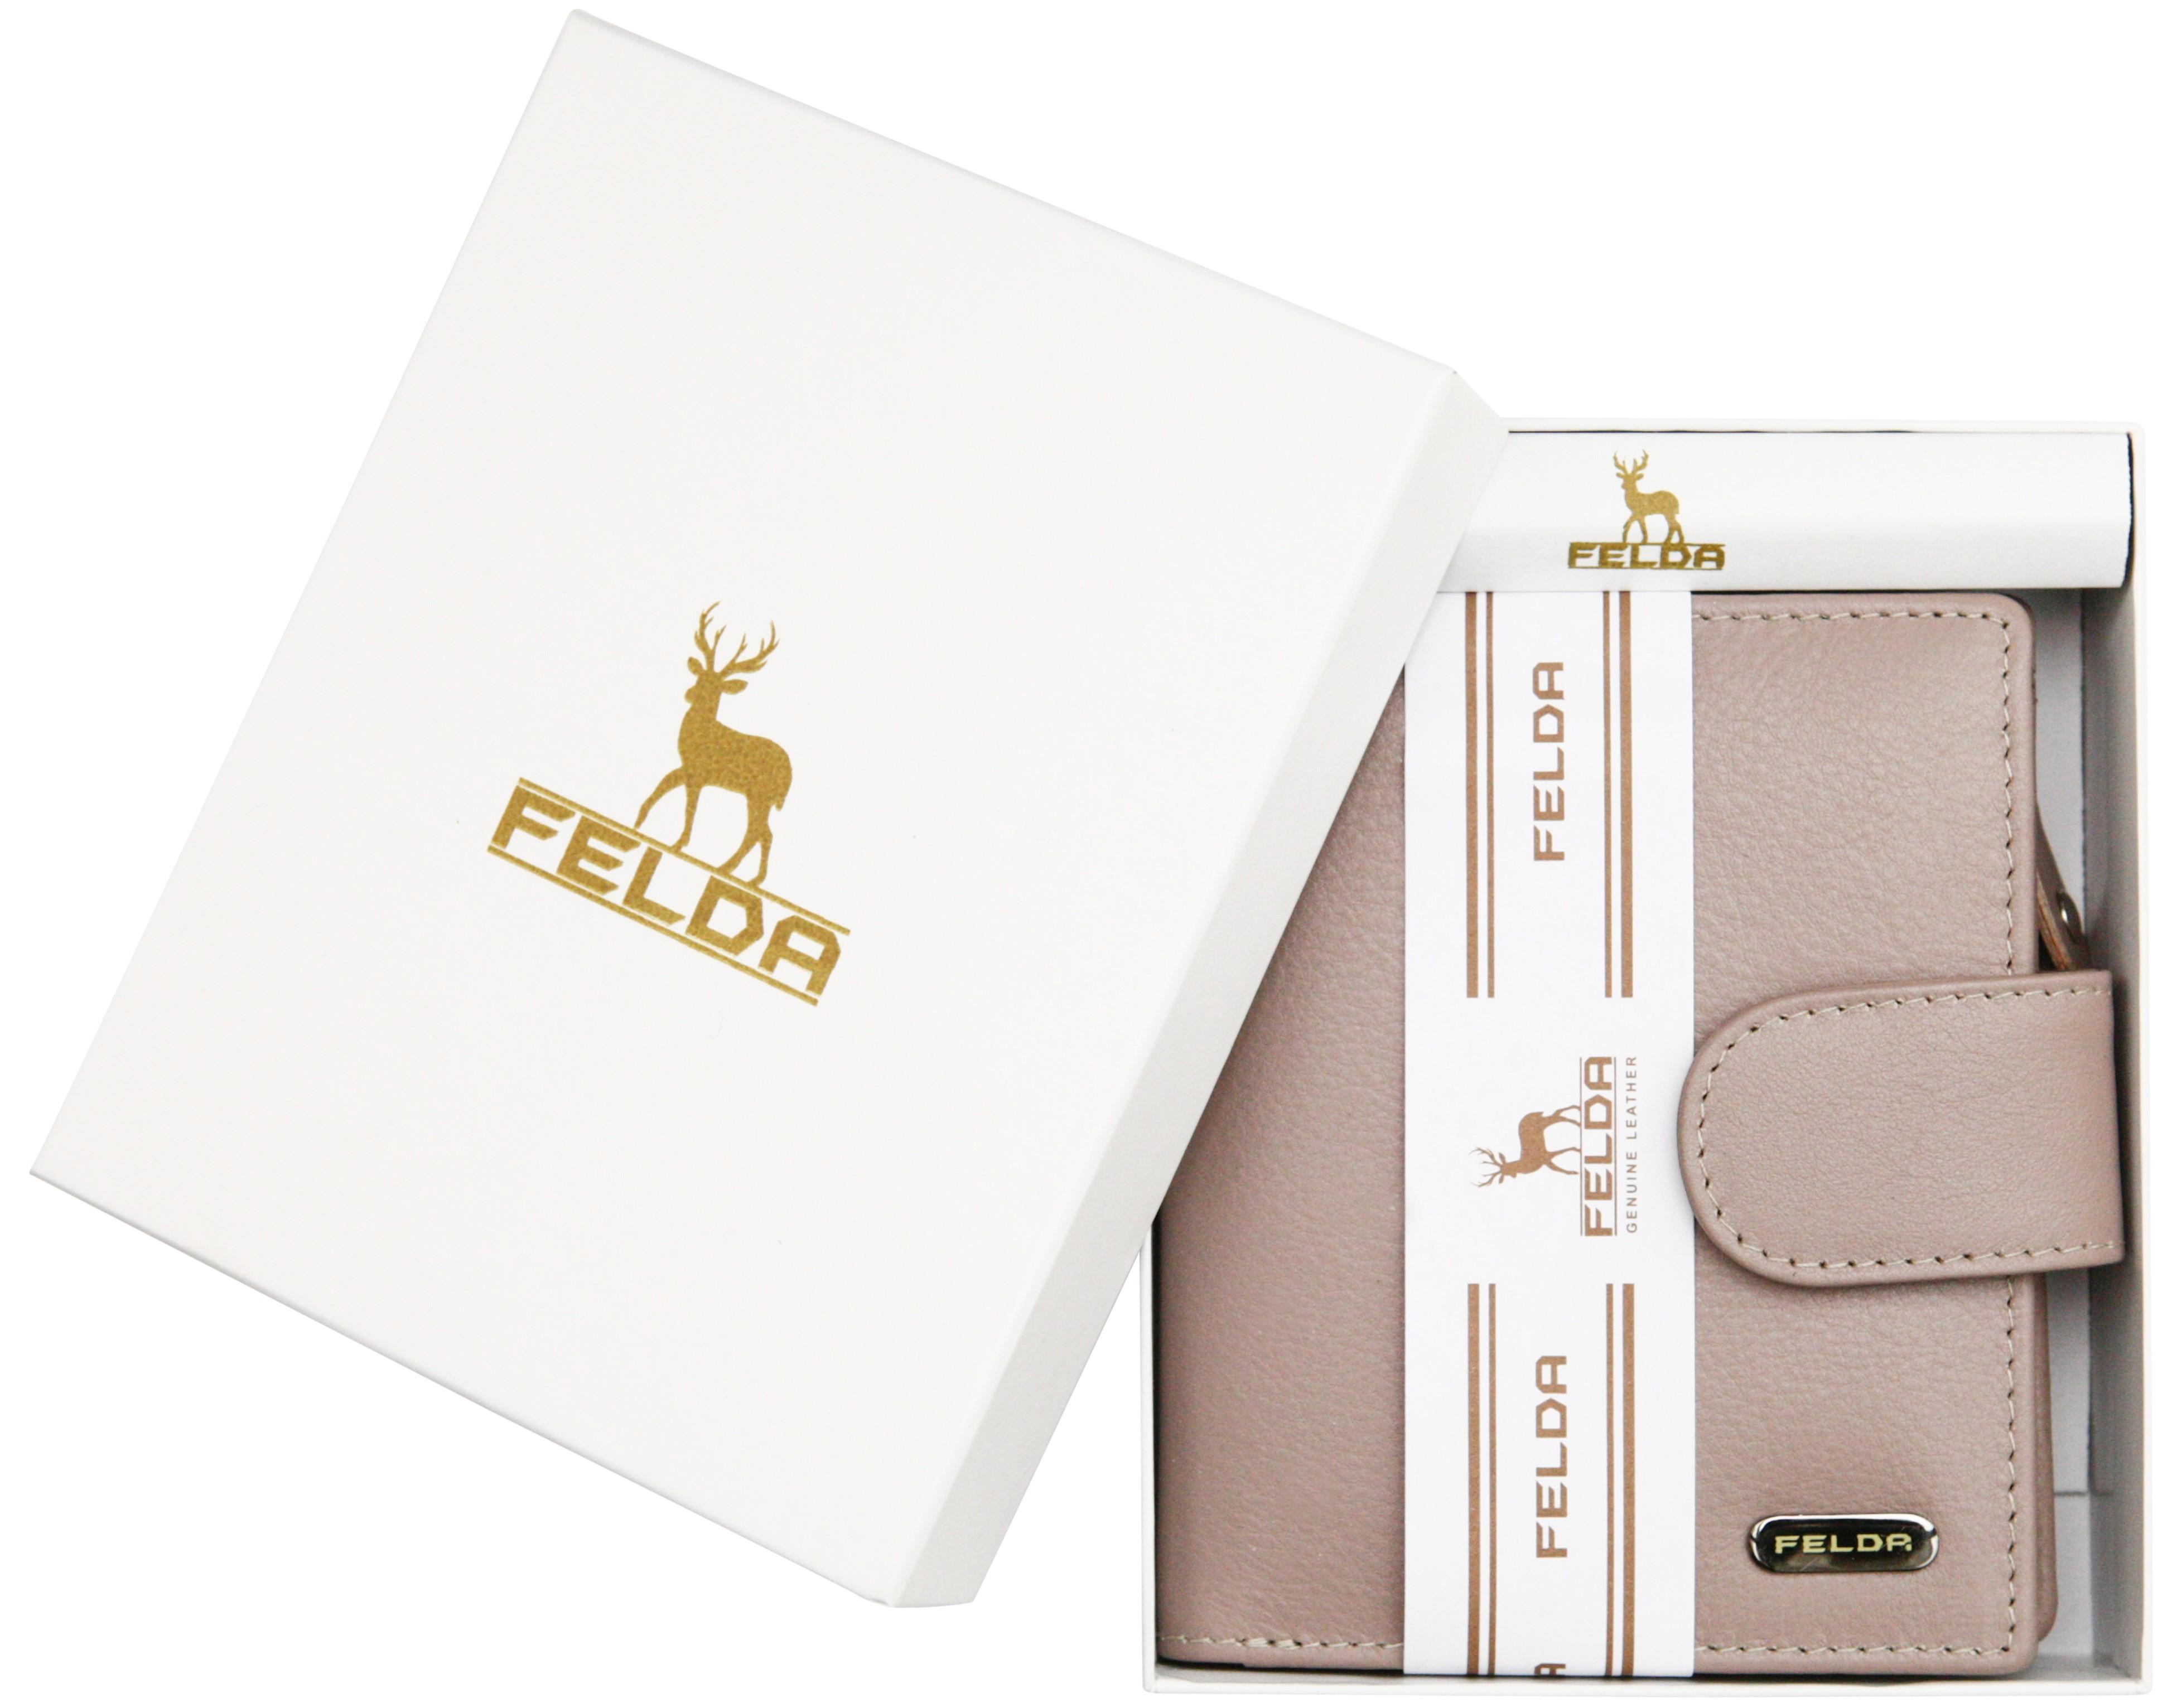 Felda-RFID-onorevoli-MEDAGLIA-amp-Card-Purse-Wallet-Genuine-Leather-Multi-SOFT-BOX-REGALO miniatura 75